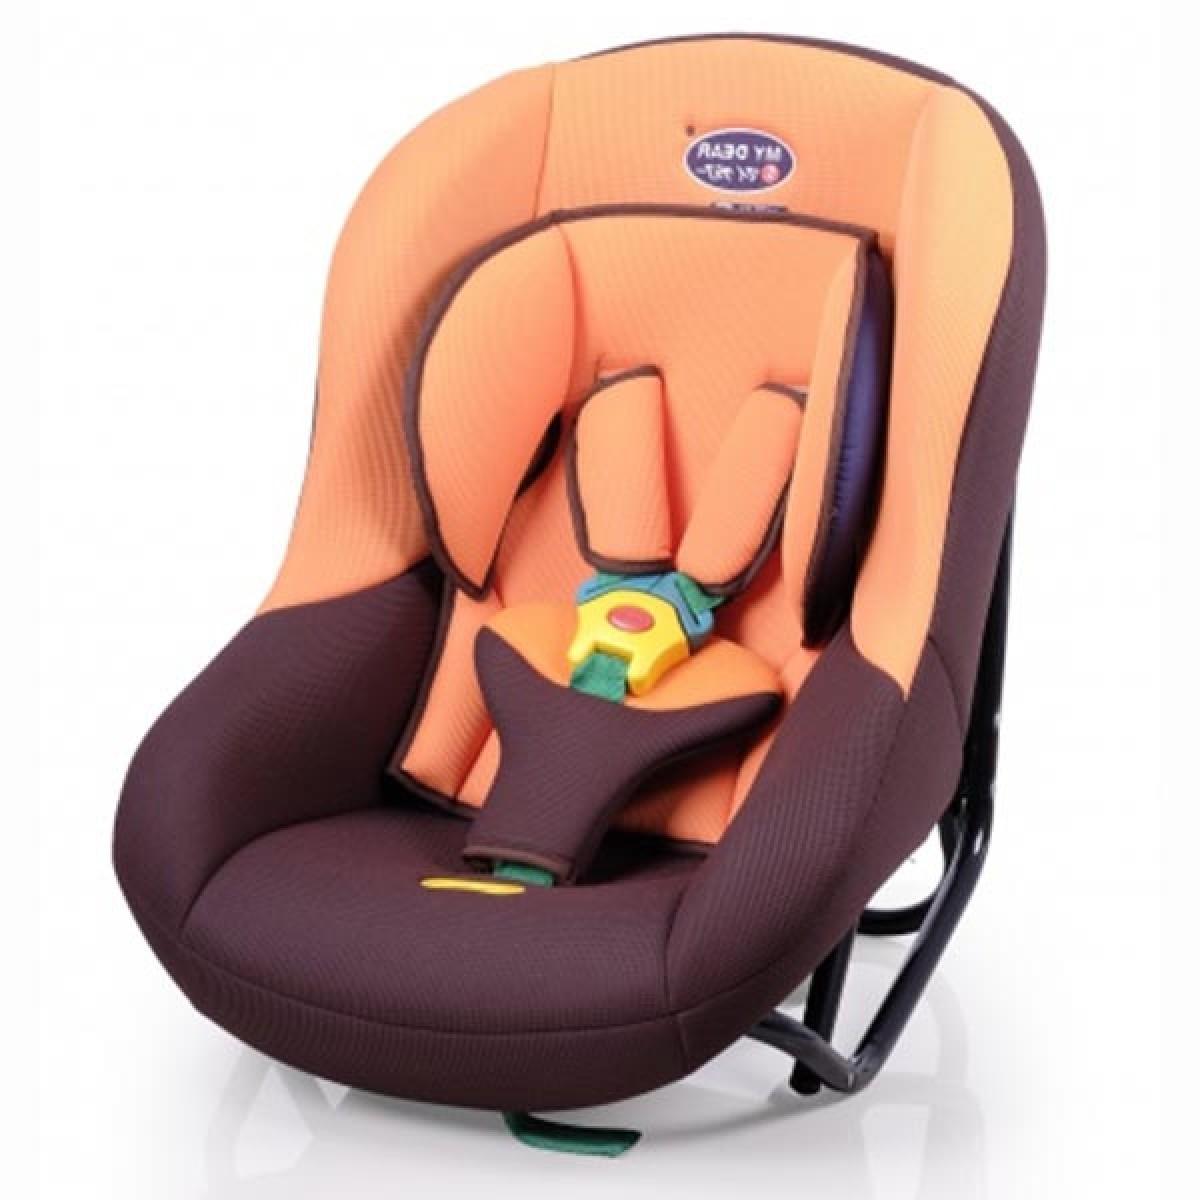 COMBI CAR SEAT - Kico Baby Center